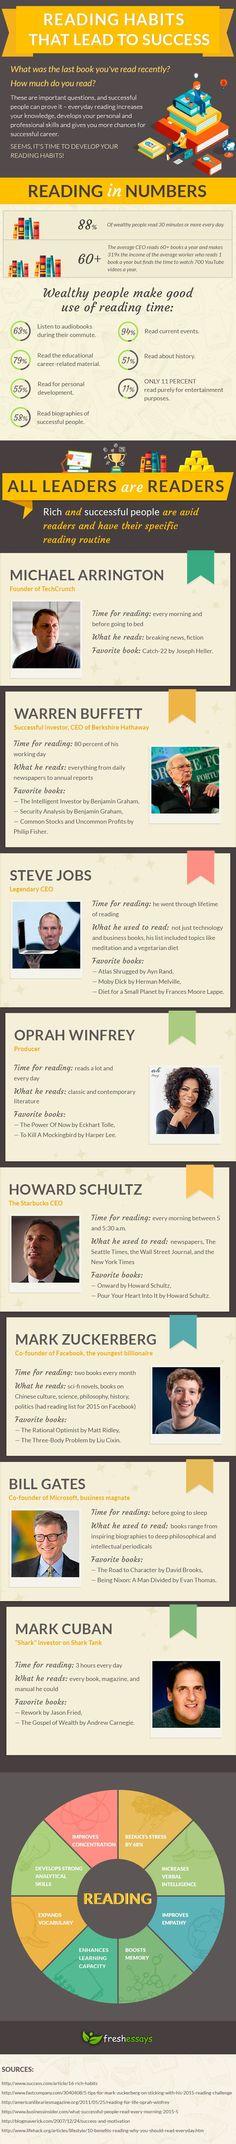 Reading Habits That Lead to Success #Infographic #ReadingHabit #SuccessStories